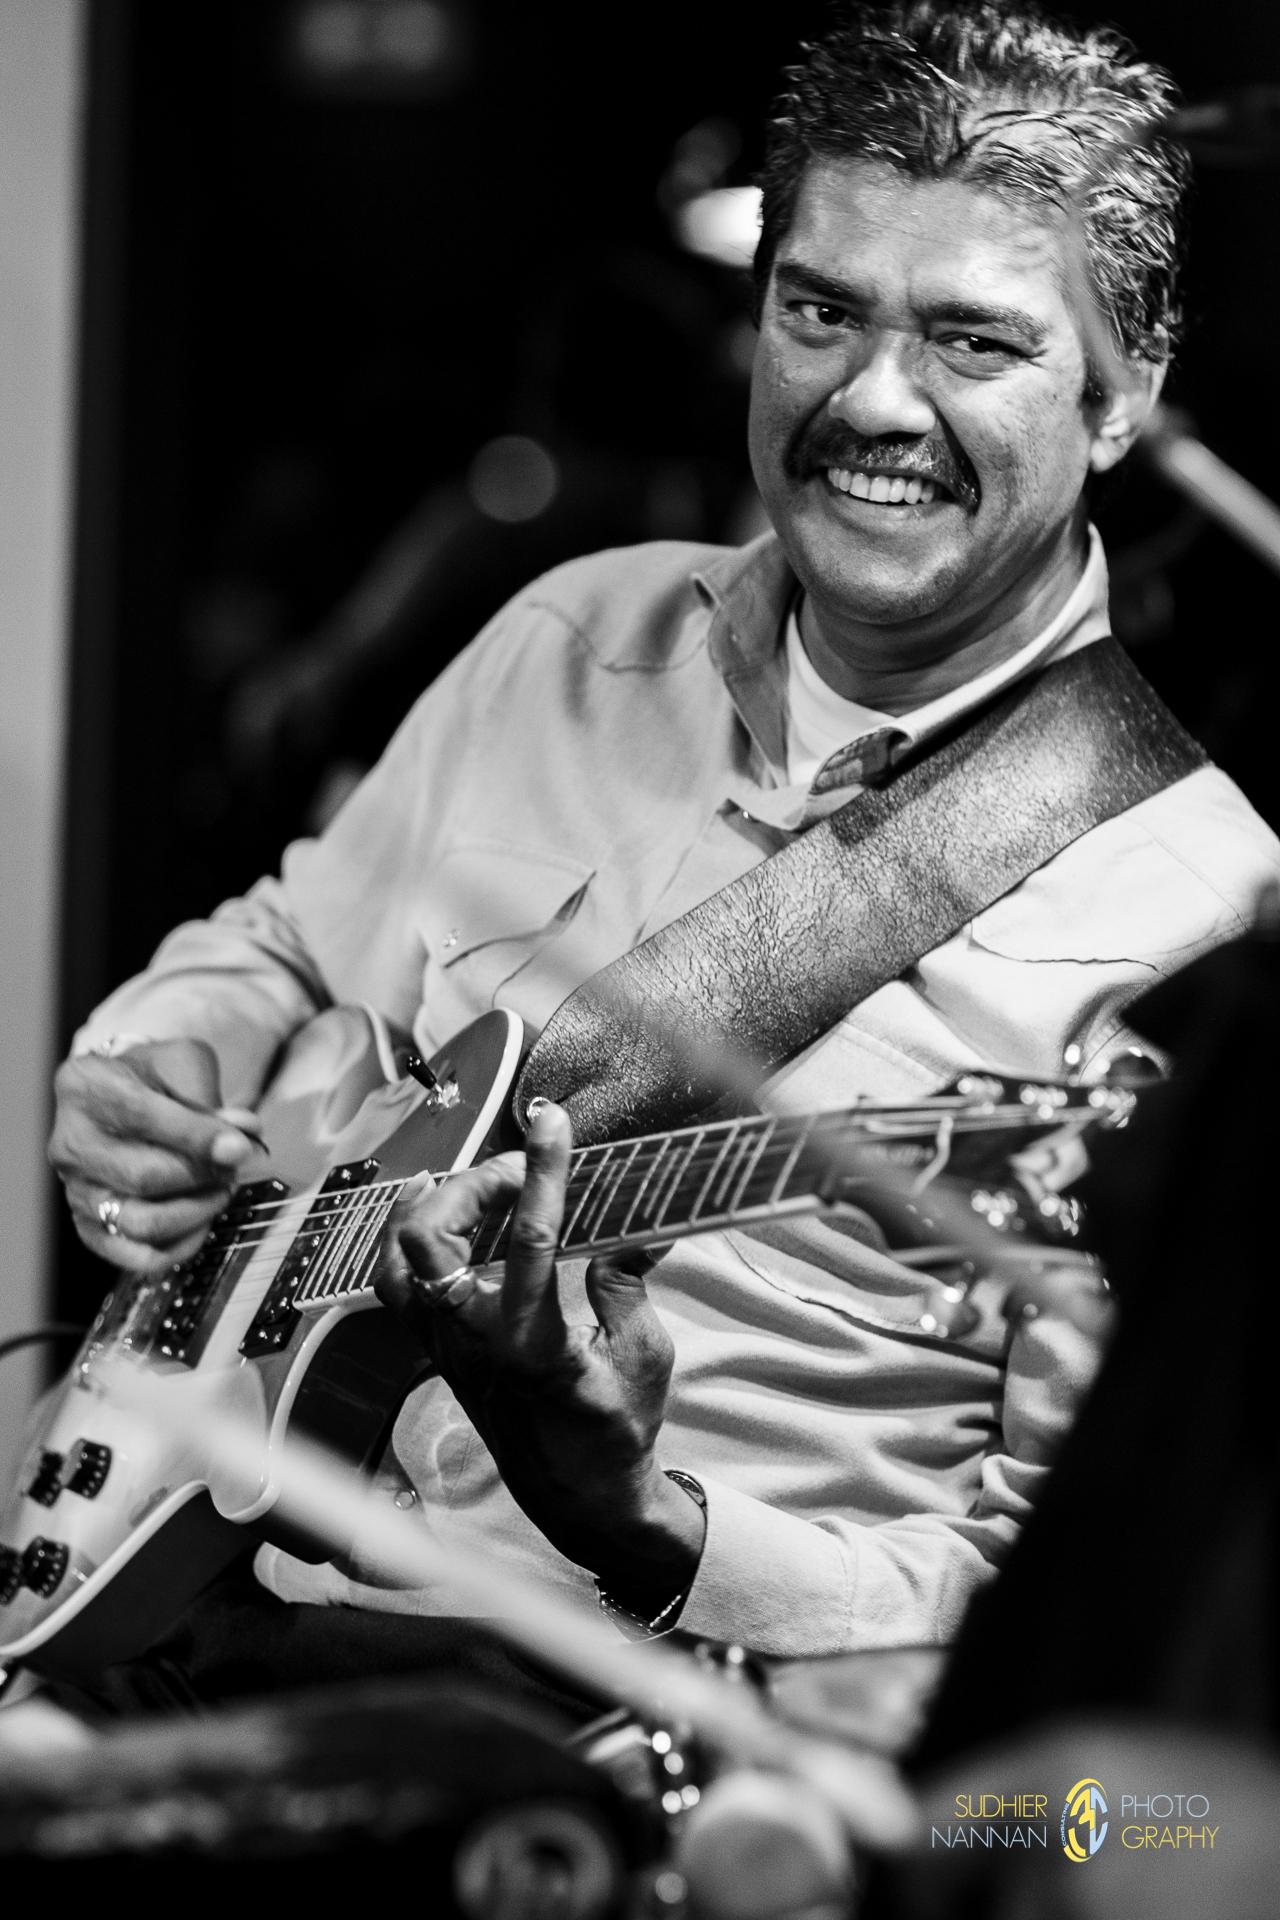 Jim Sewpersad